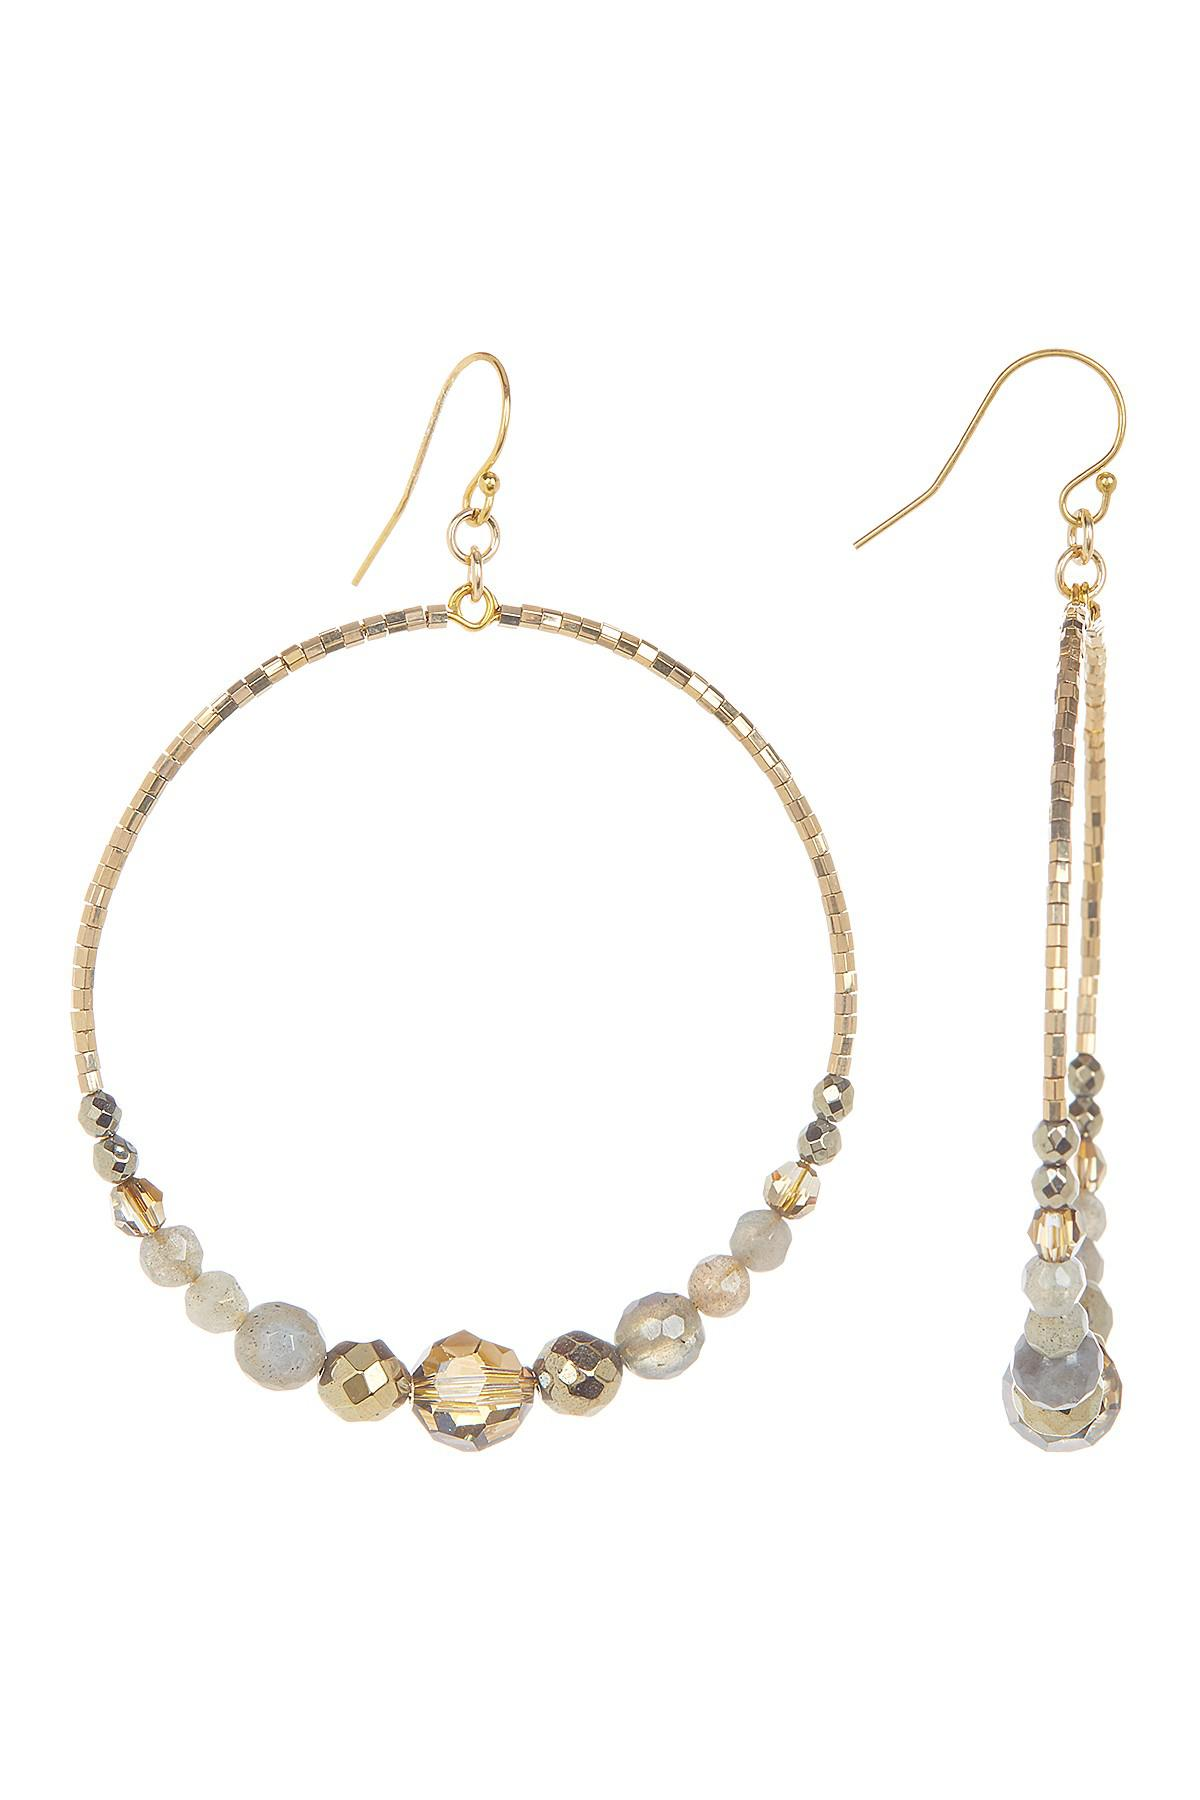 Chan Luu Gold-plated Beaded Earrings pOrVa